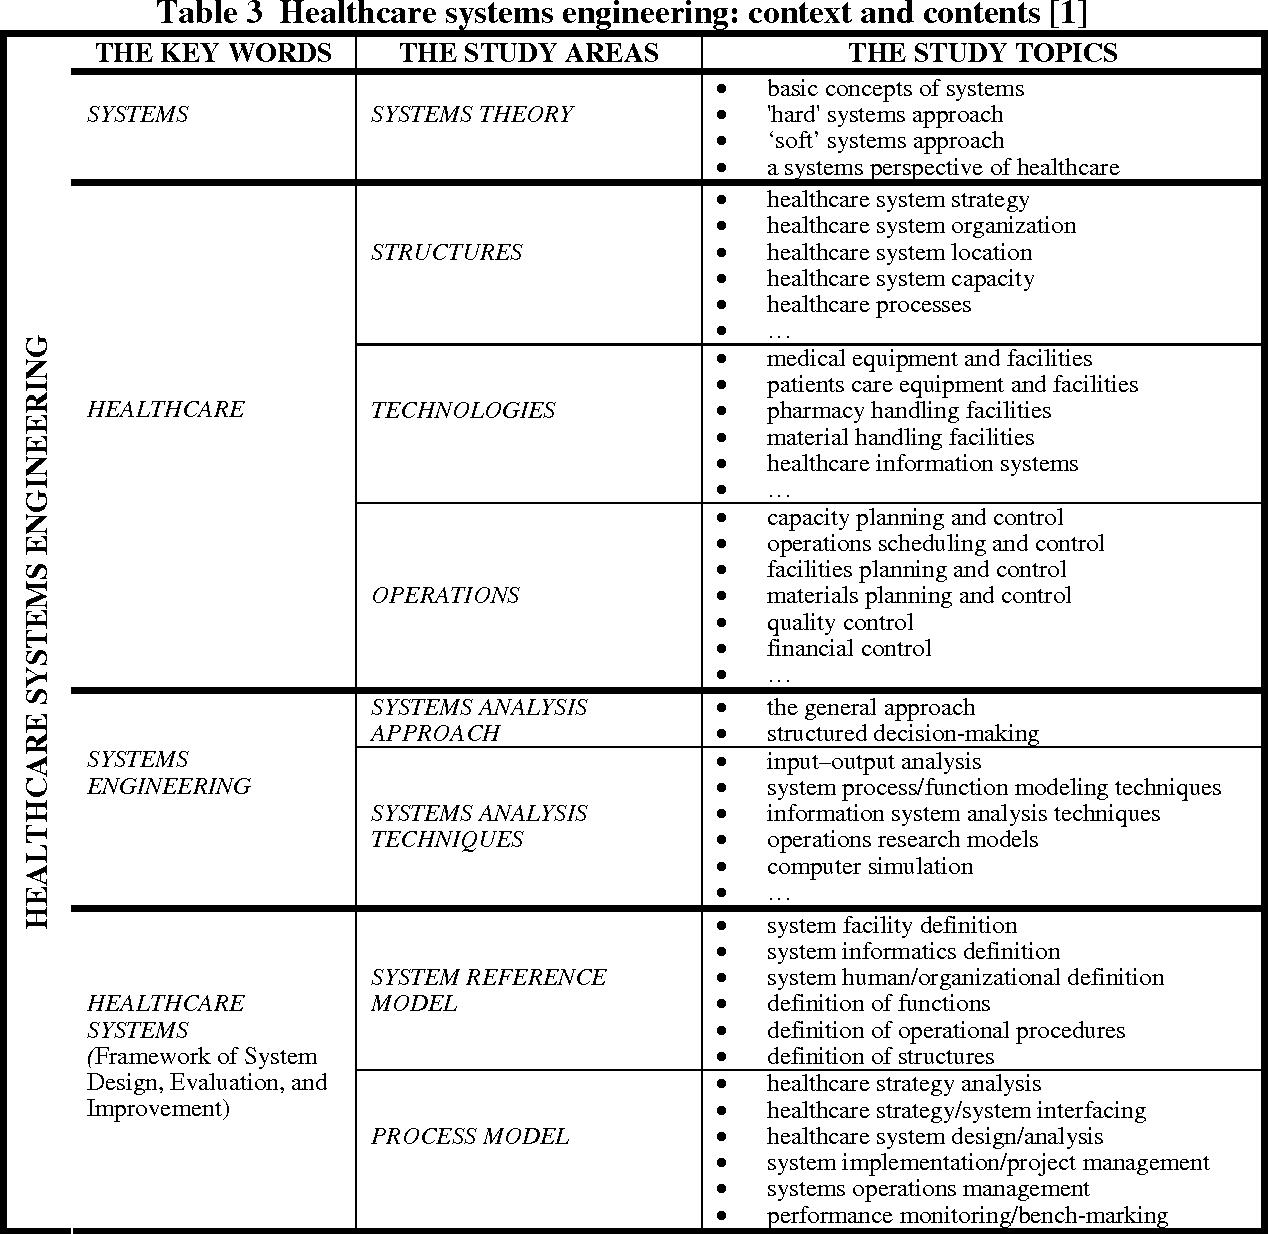 PDF] AC 2007-122: CONCEPTUAL FRAMEWORK OF HEALTHCARE SYSTEMS